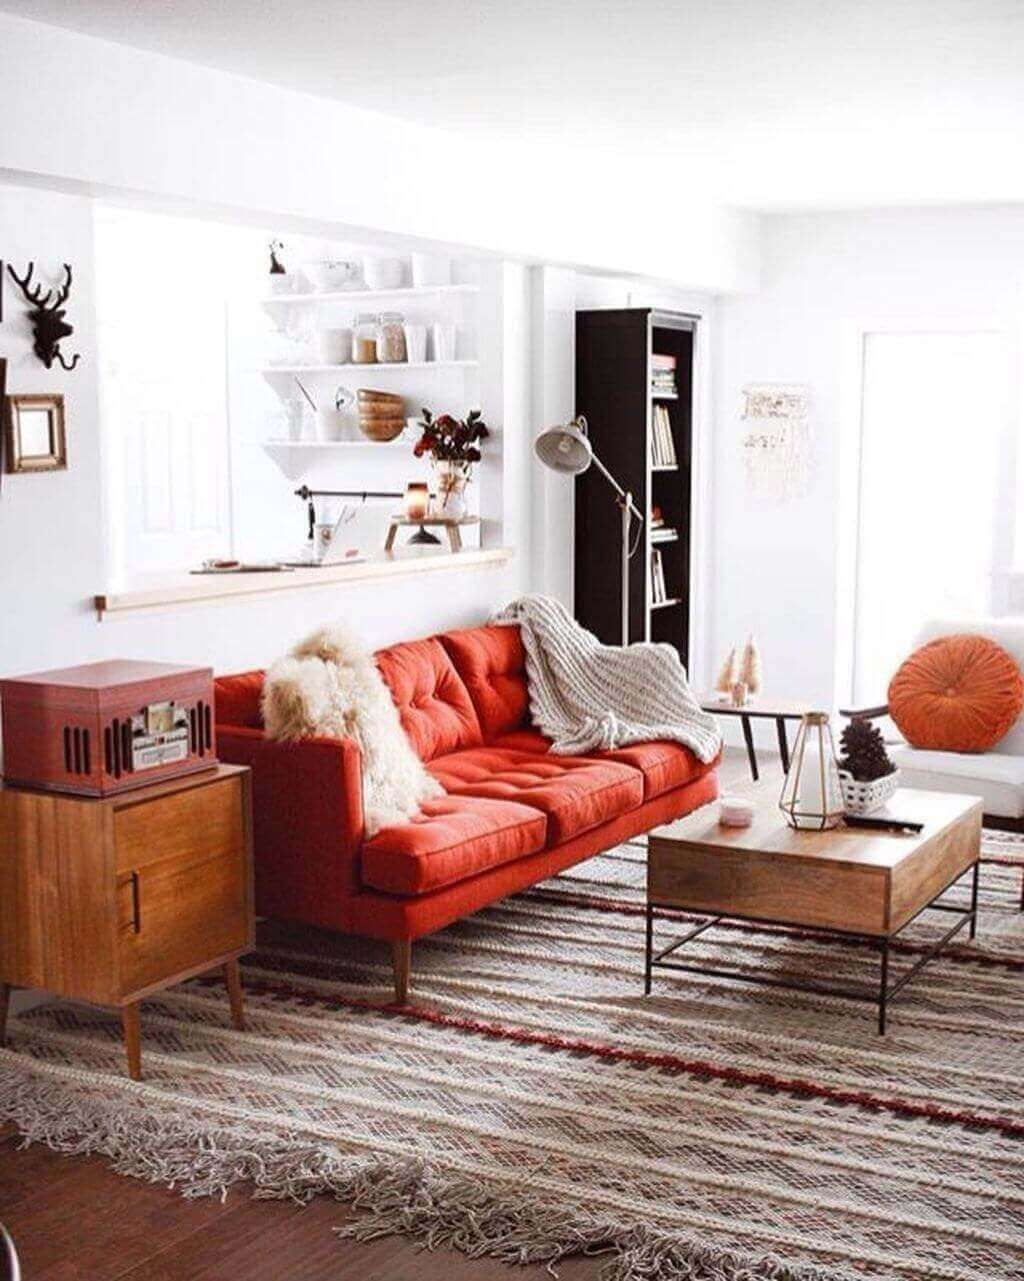 Show Living Rooms Already Decorated: 30 Scandinavian Living Room Design Ideas